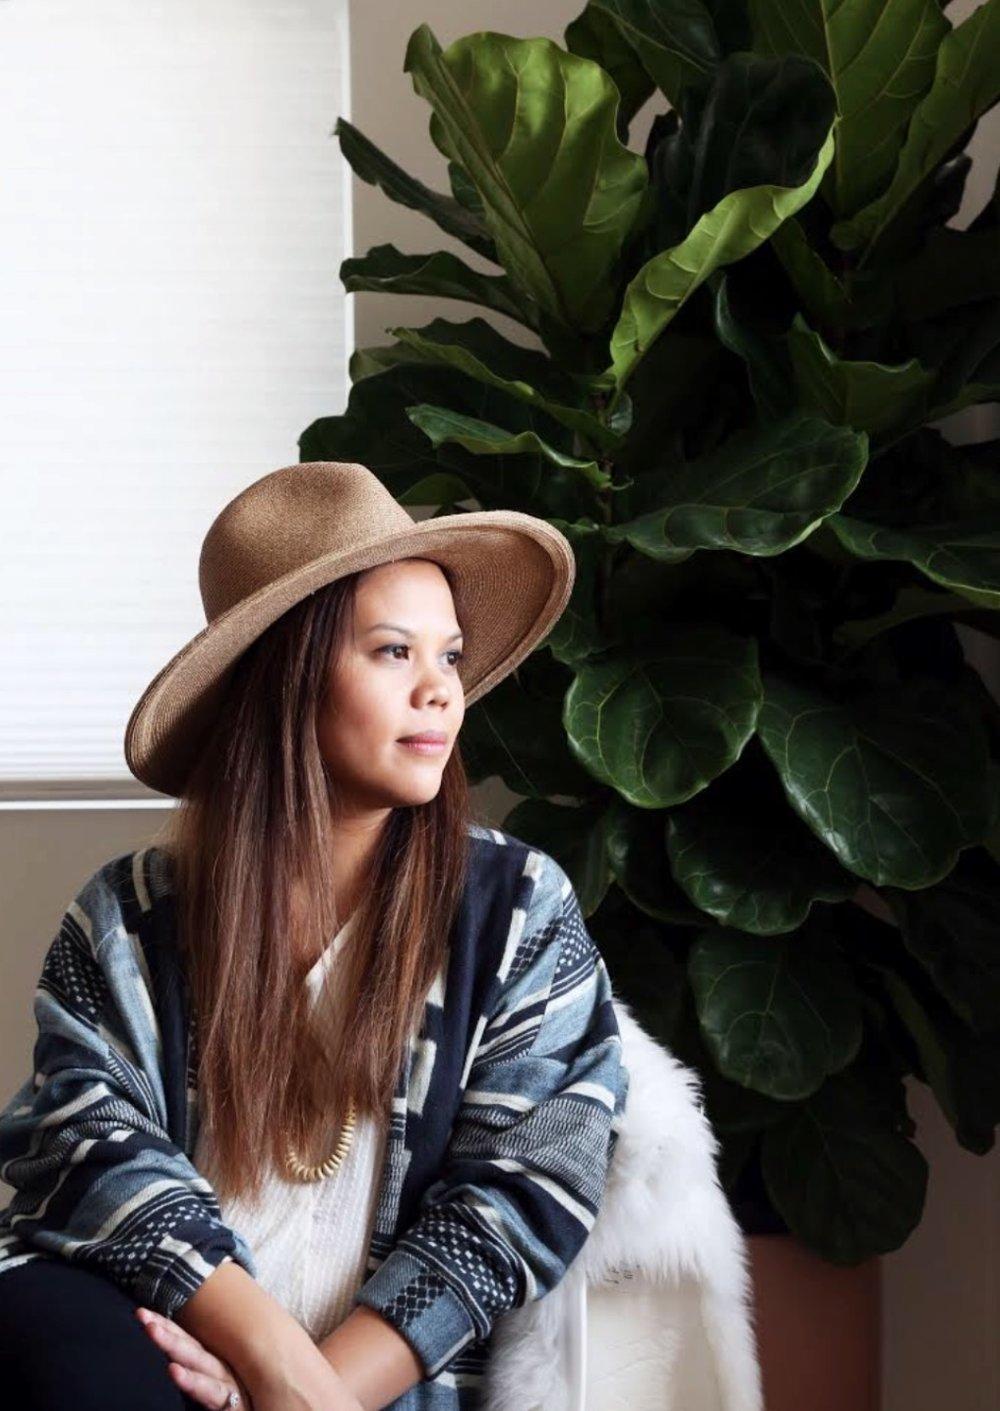 CHRISTINE TURKNETT - Creative Director & Principal Designer